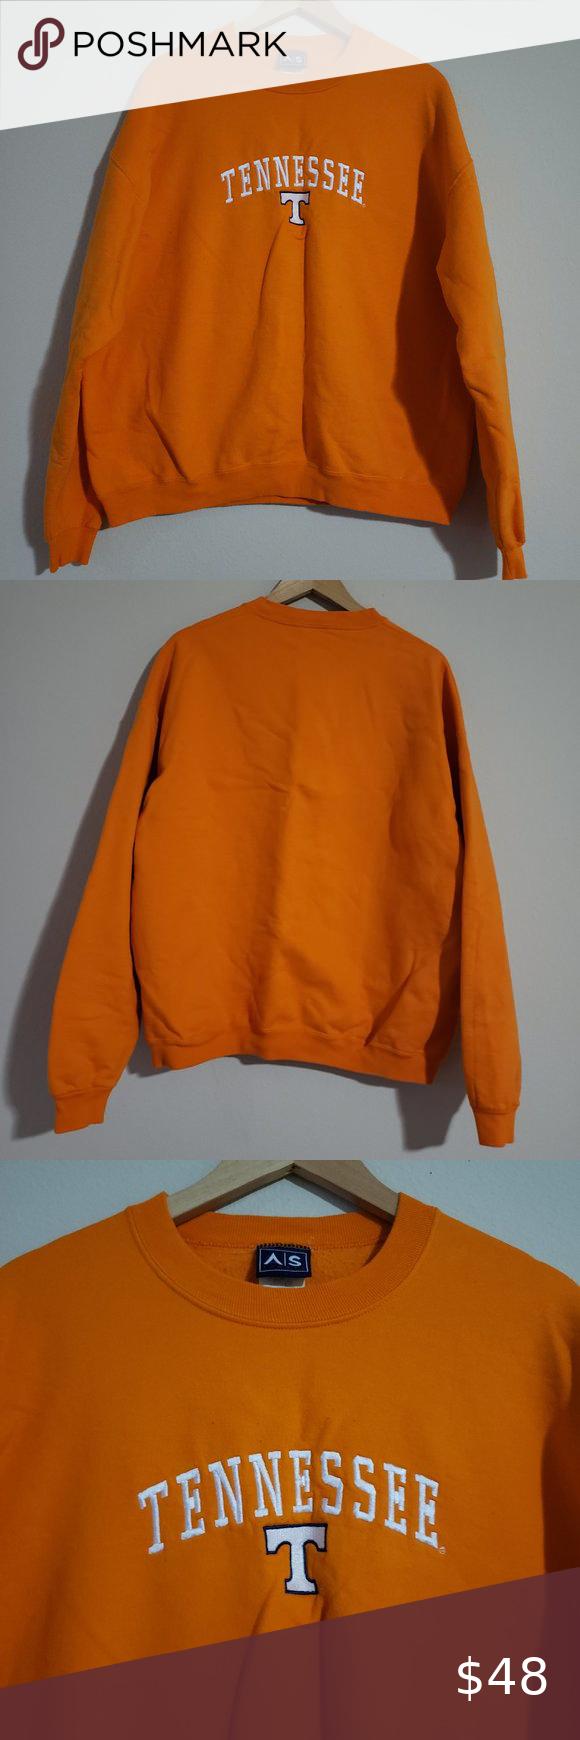 Vintage Cadre Athletics Tennessee Sweatshirt Xl In 2020 Sweatshirts Sweatshirt Shirt Vintage Sweatshirt [ 1740 x 580 Pixel ]